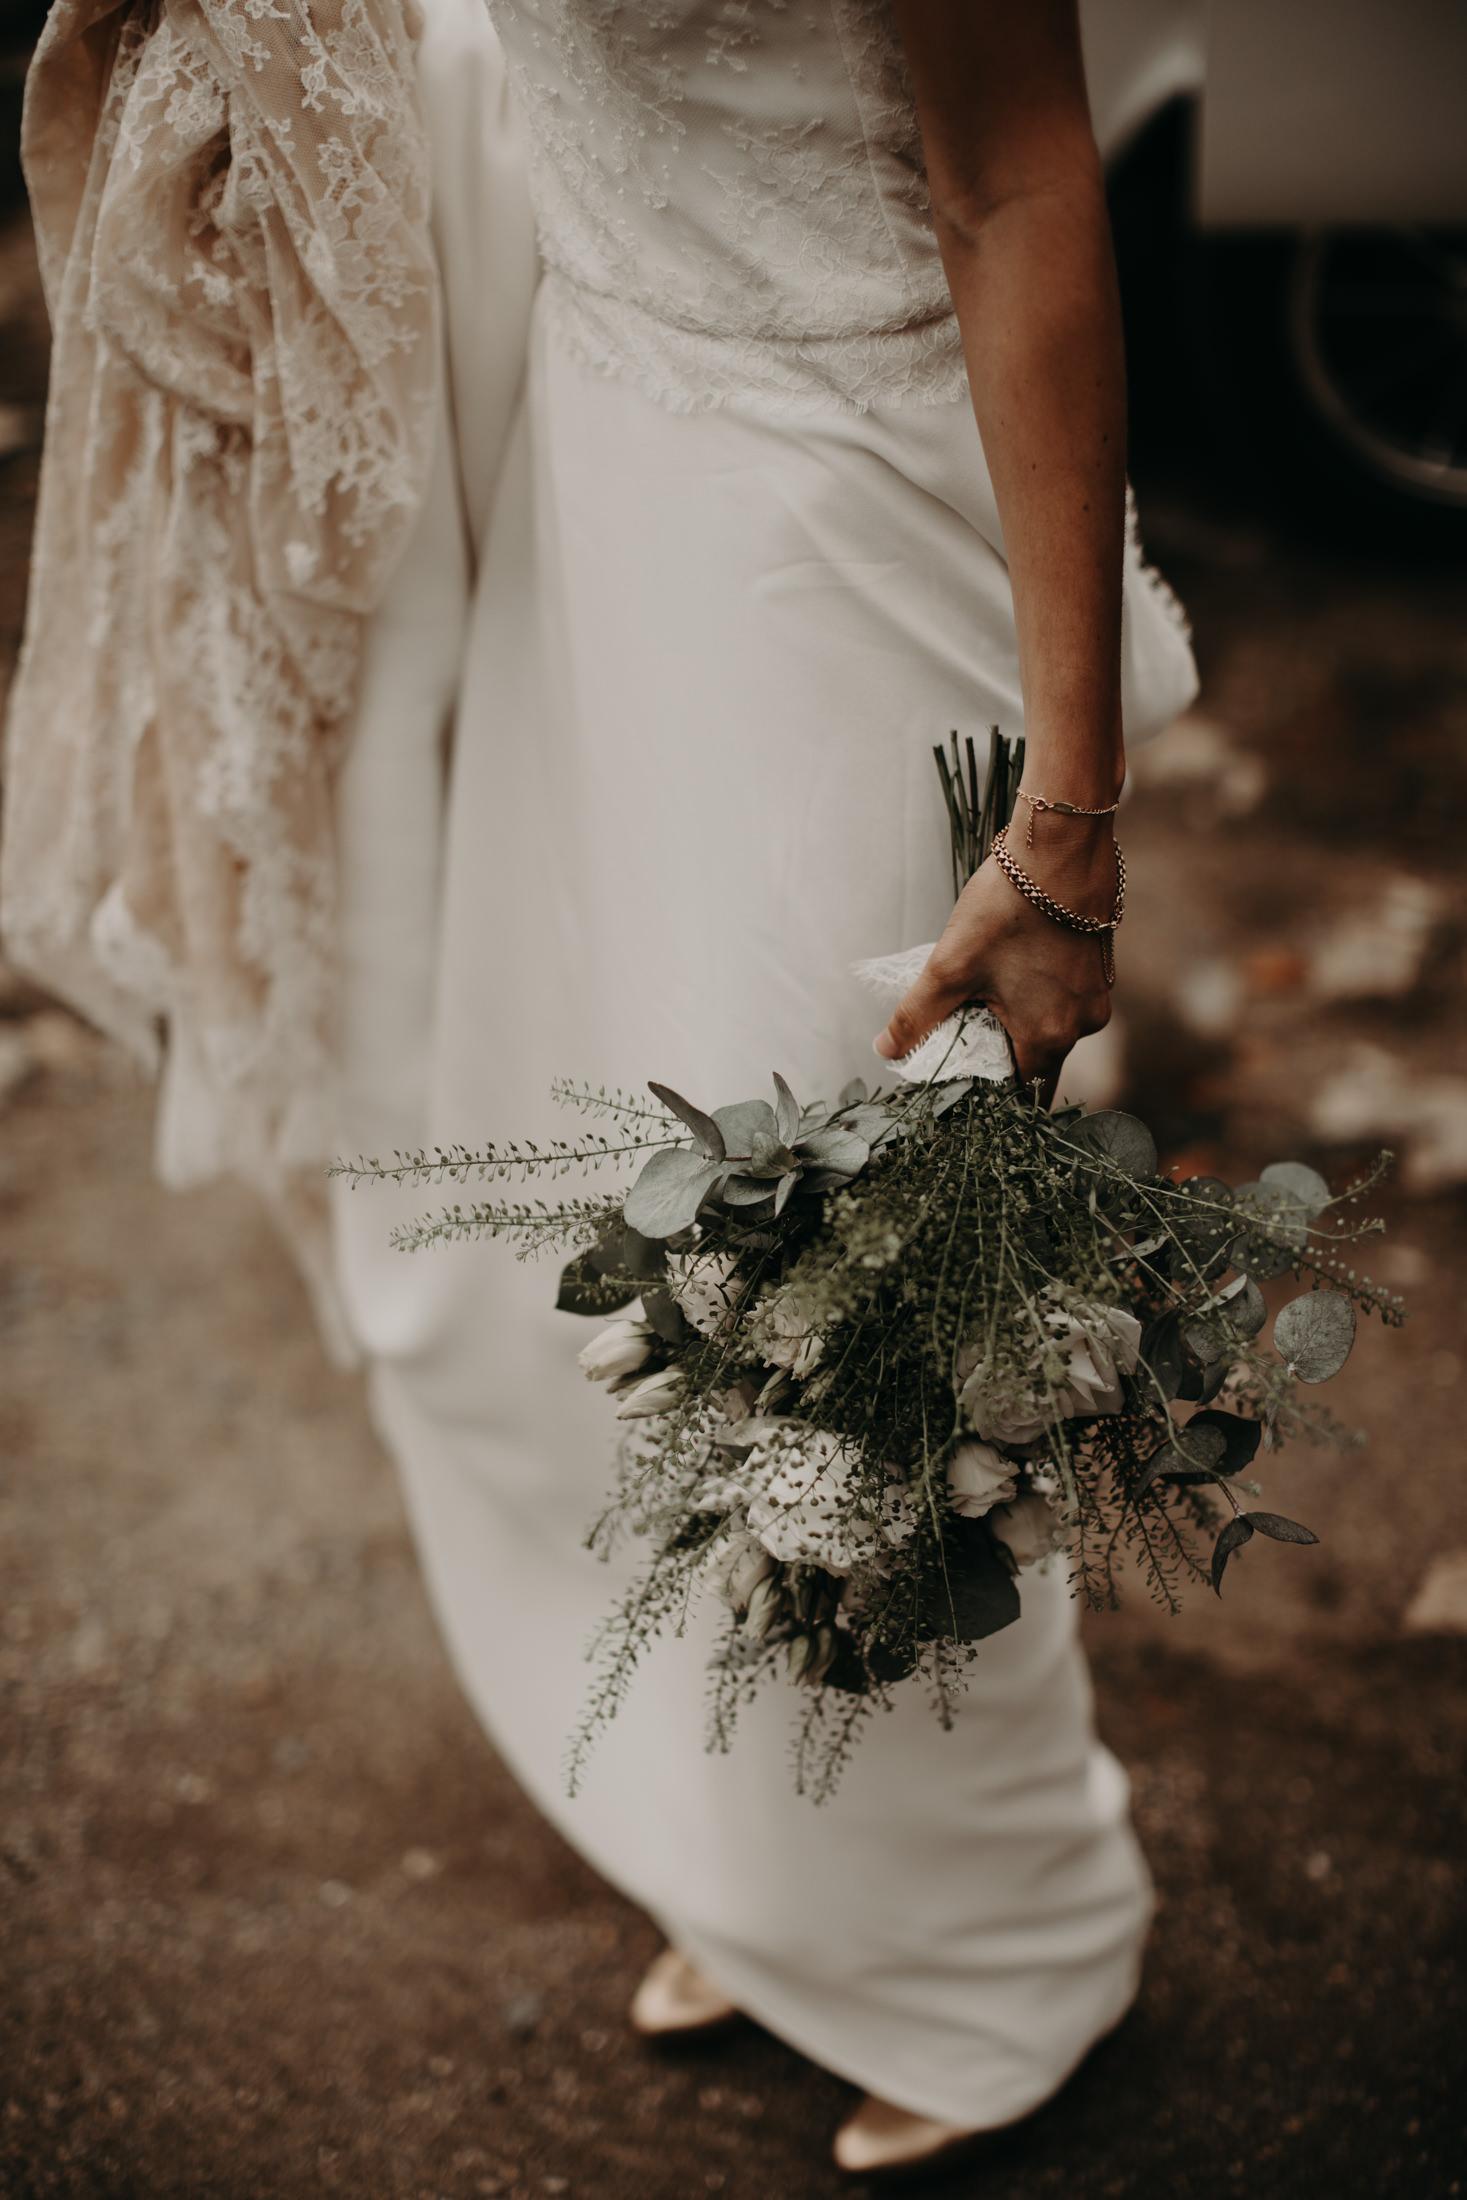 Mariage auvergne photographe wedding_-31.jpg